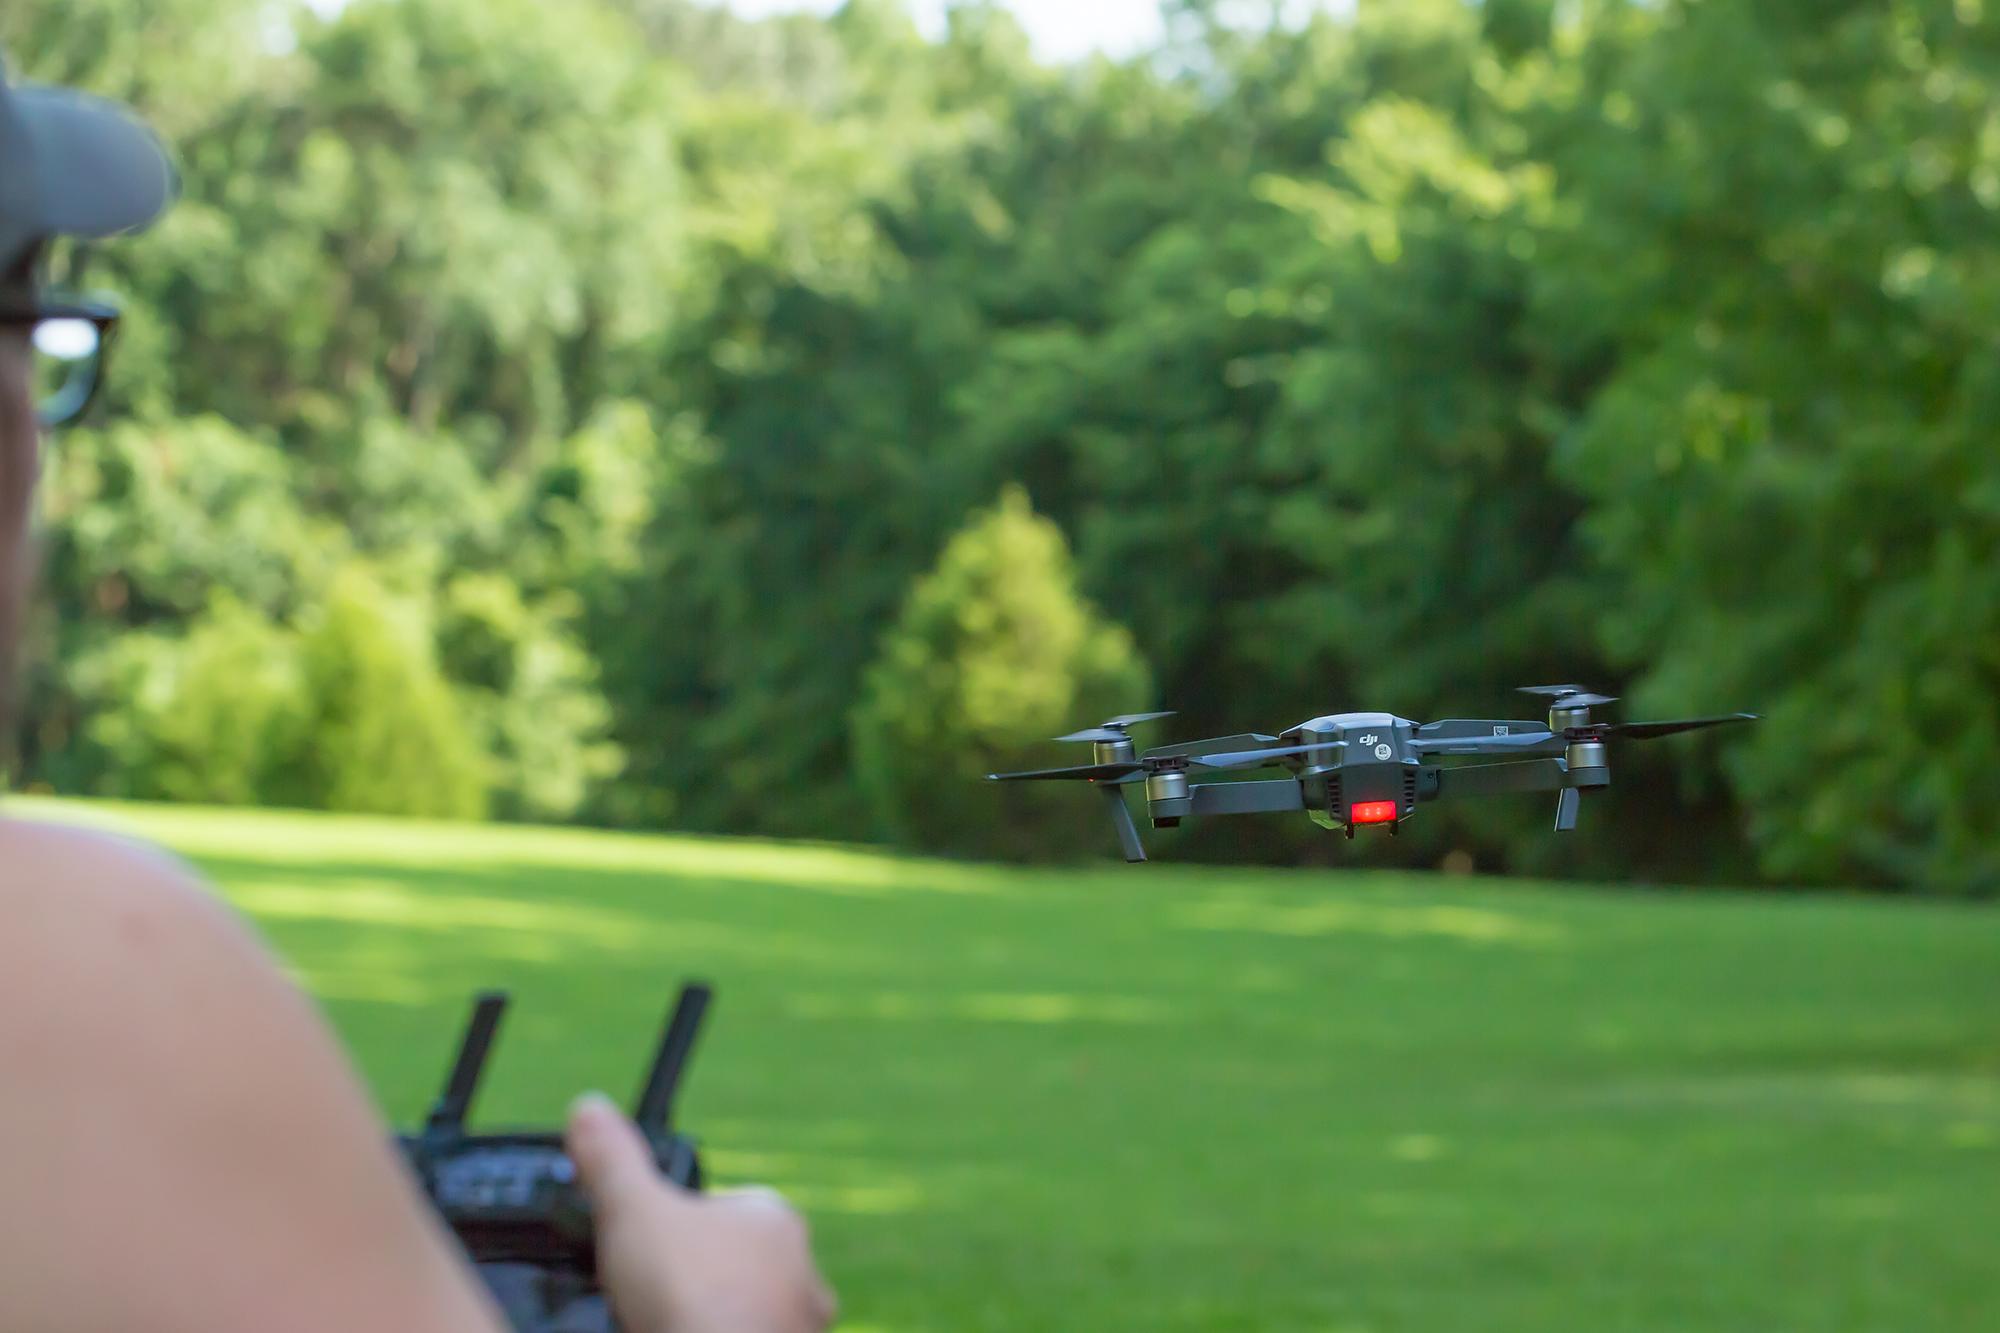 drone camera under 1000